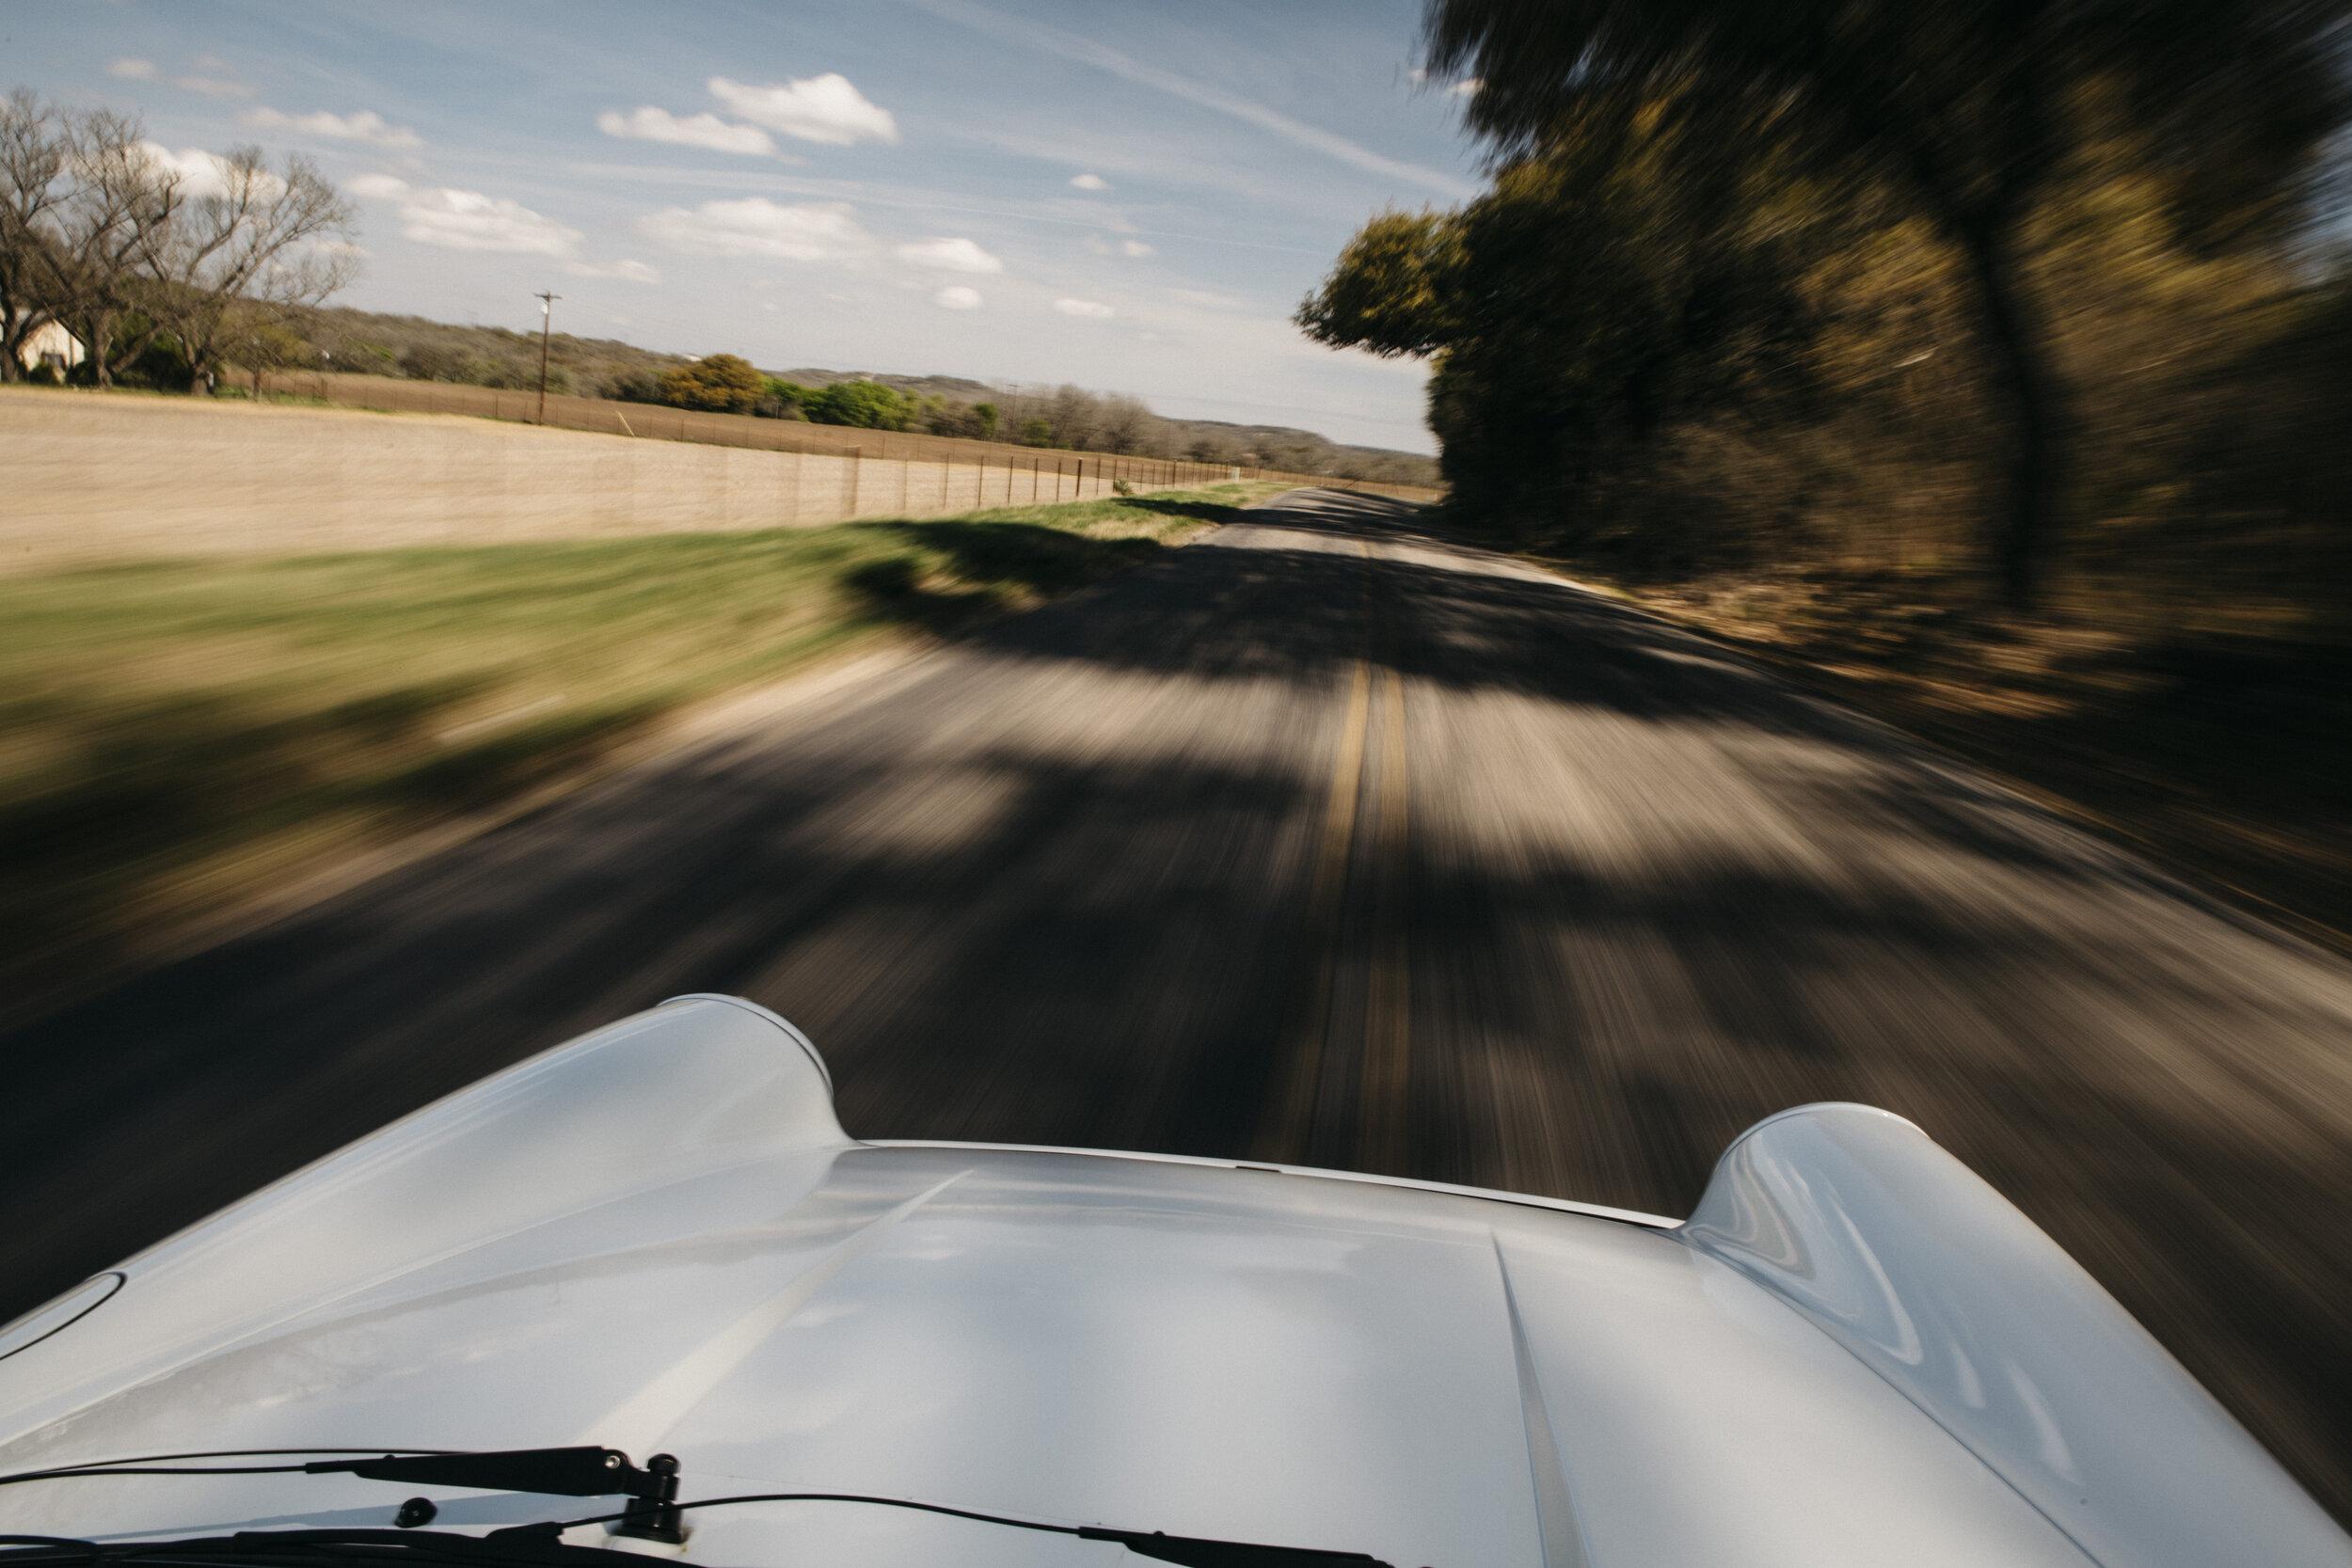 Hill Country Rallye 2019